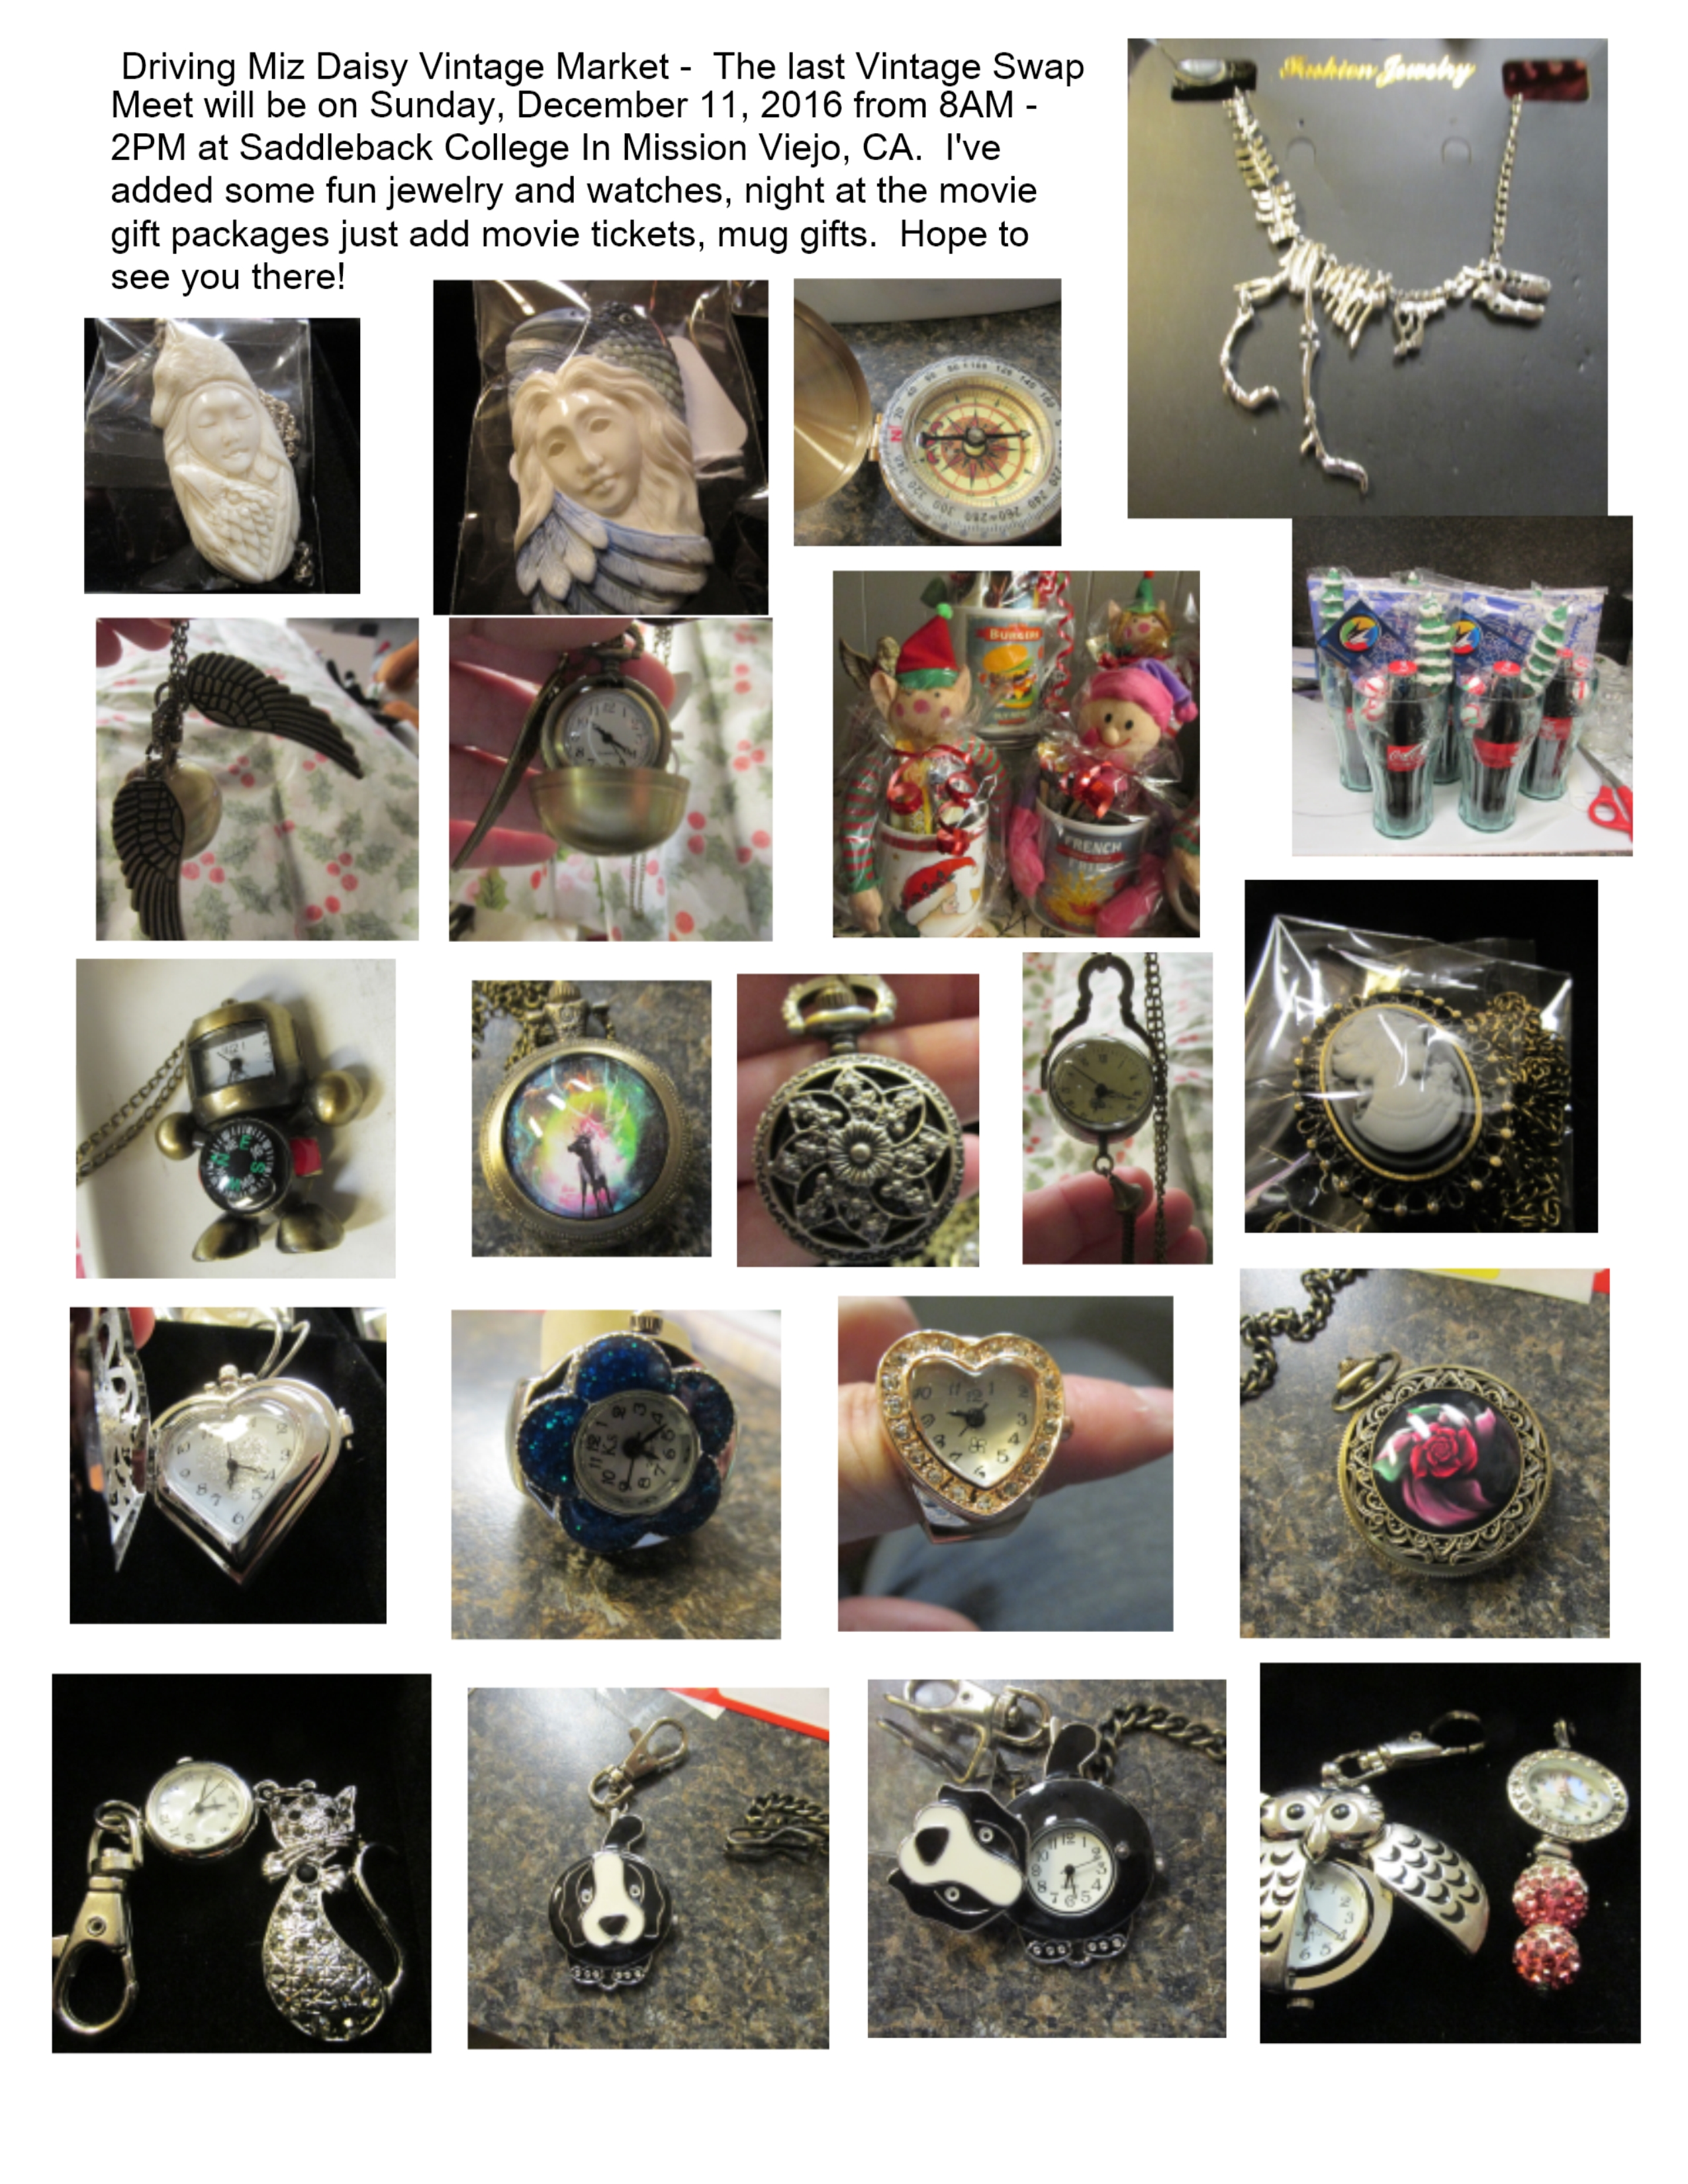 Vintage swap meet jewelry watches lynndaviscakes for Jewelry slauson swap meet